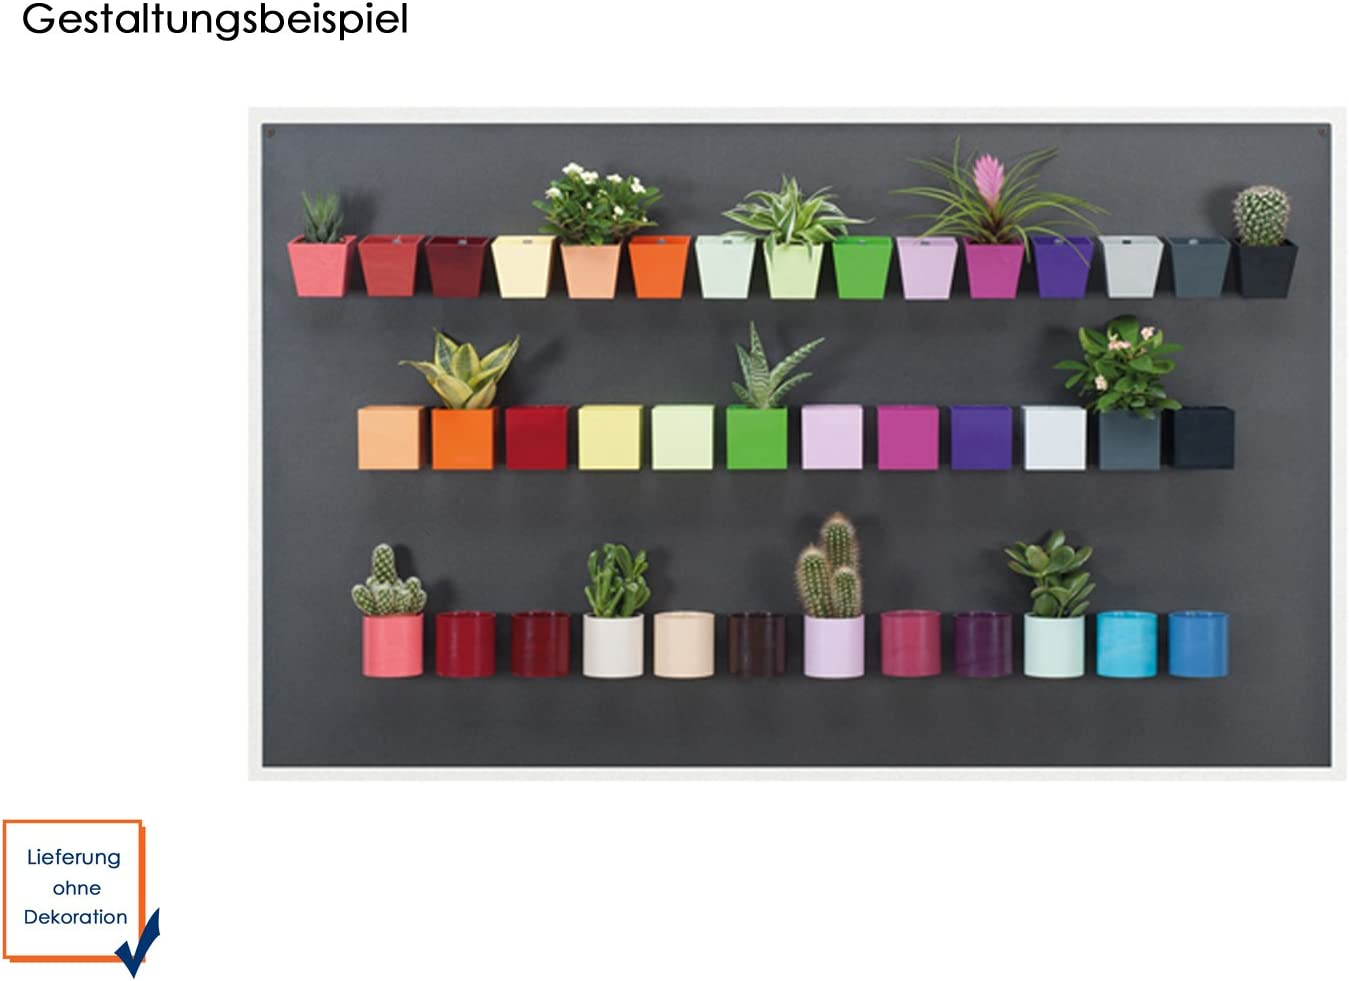 Wall Decoration forma piramidale Pentola magnetica per parete colore verde /Ø 6 cm KalaMitica 51005-602-001